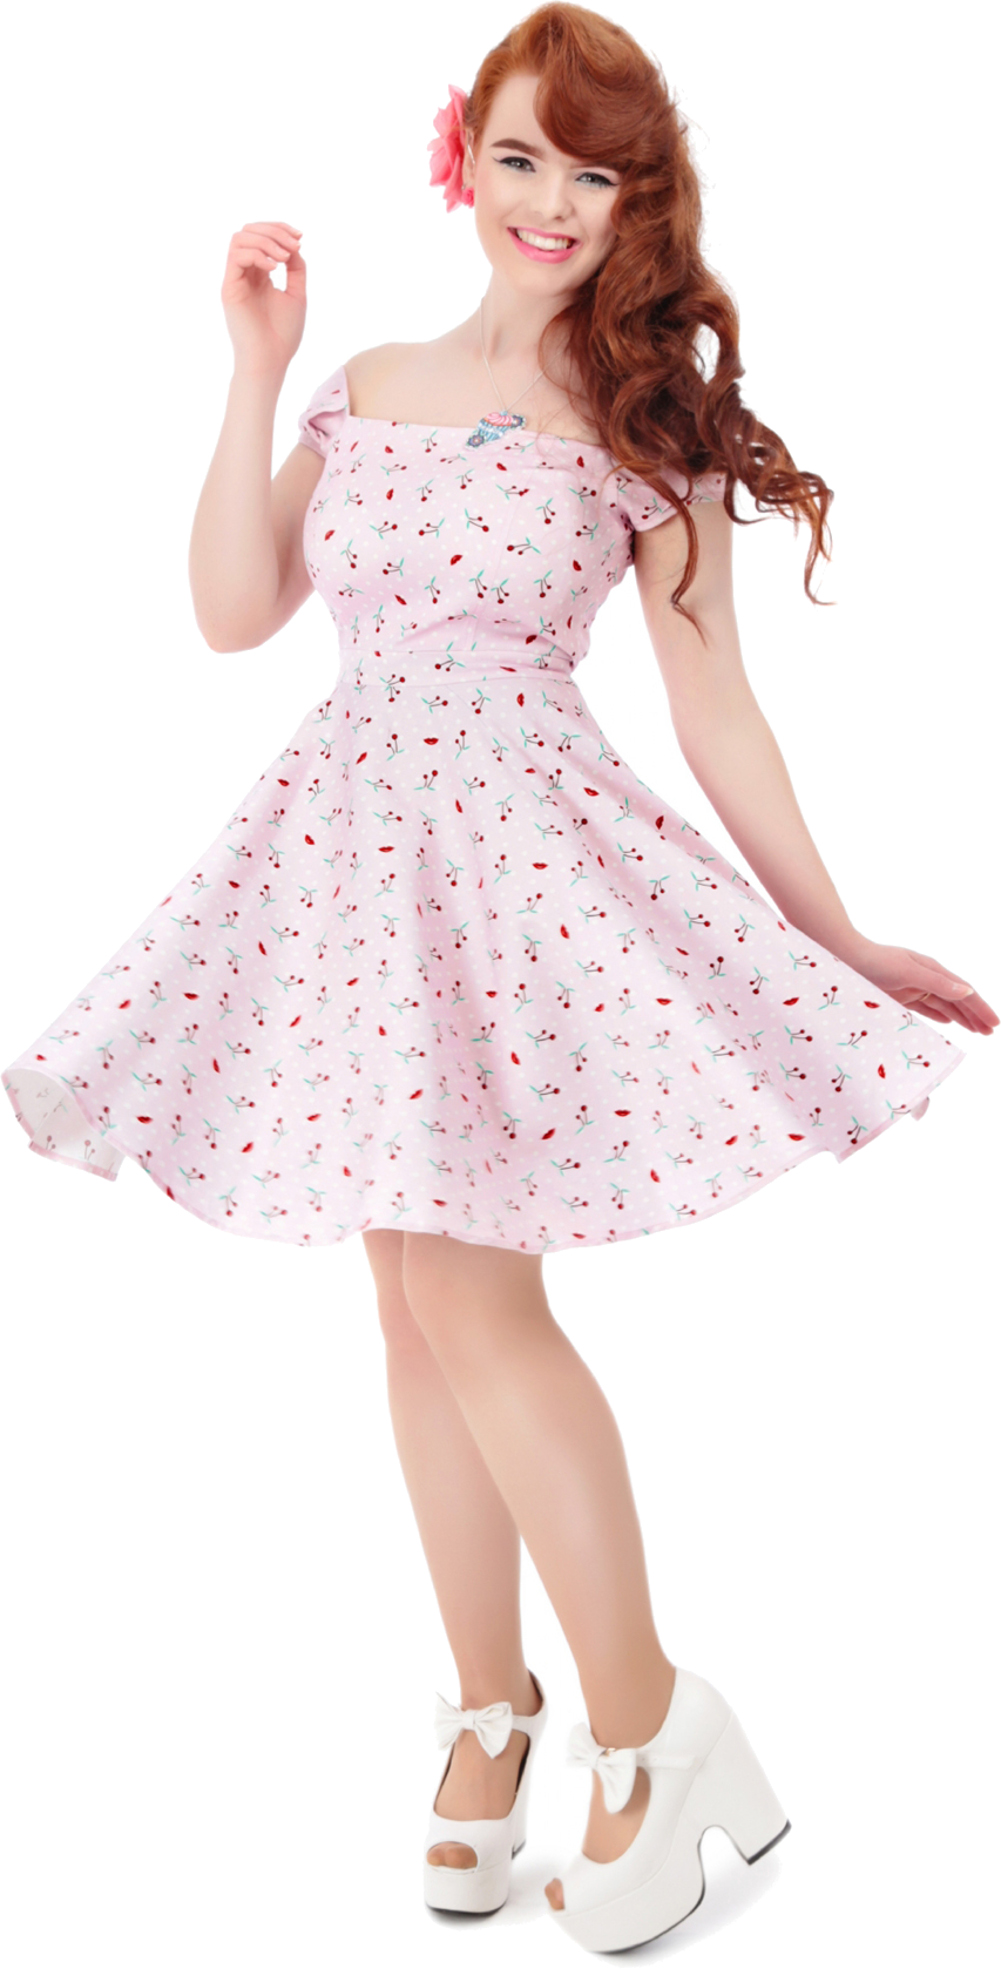 collectif ramona cherry kirschen vintage polka dots dress kleid rosa rockabilly ebay. Black Bedroom Furniture Sets. Home Design Ideas